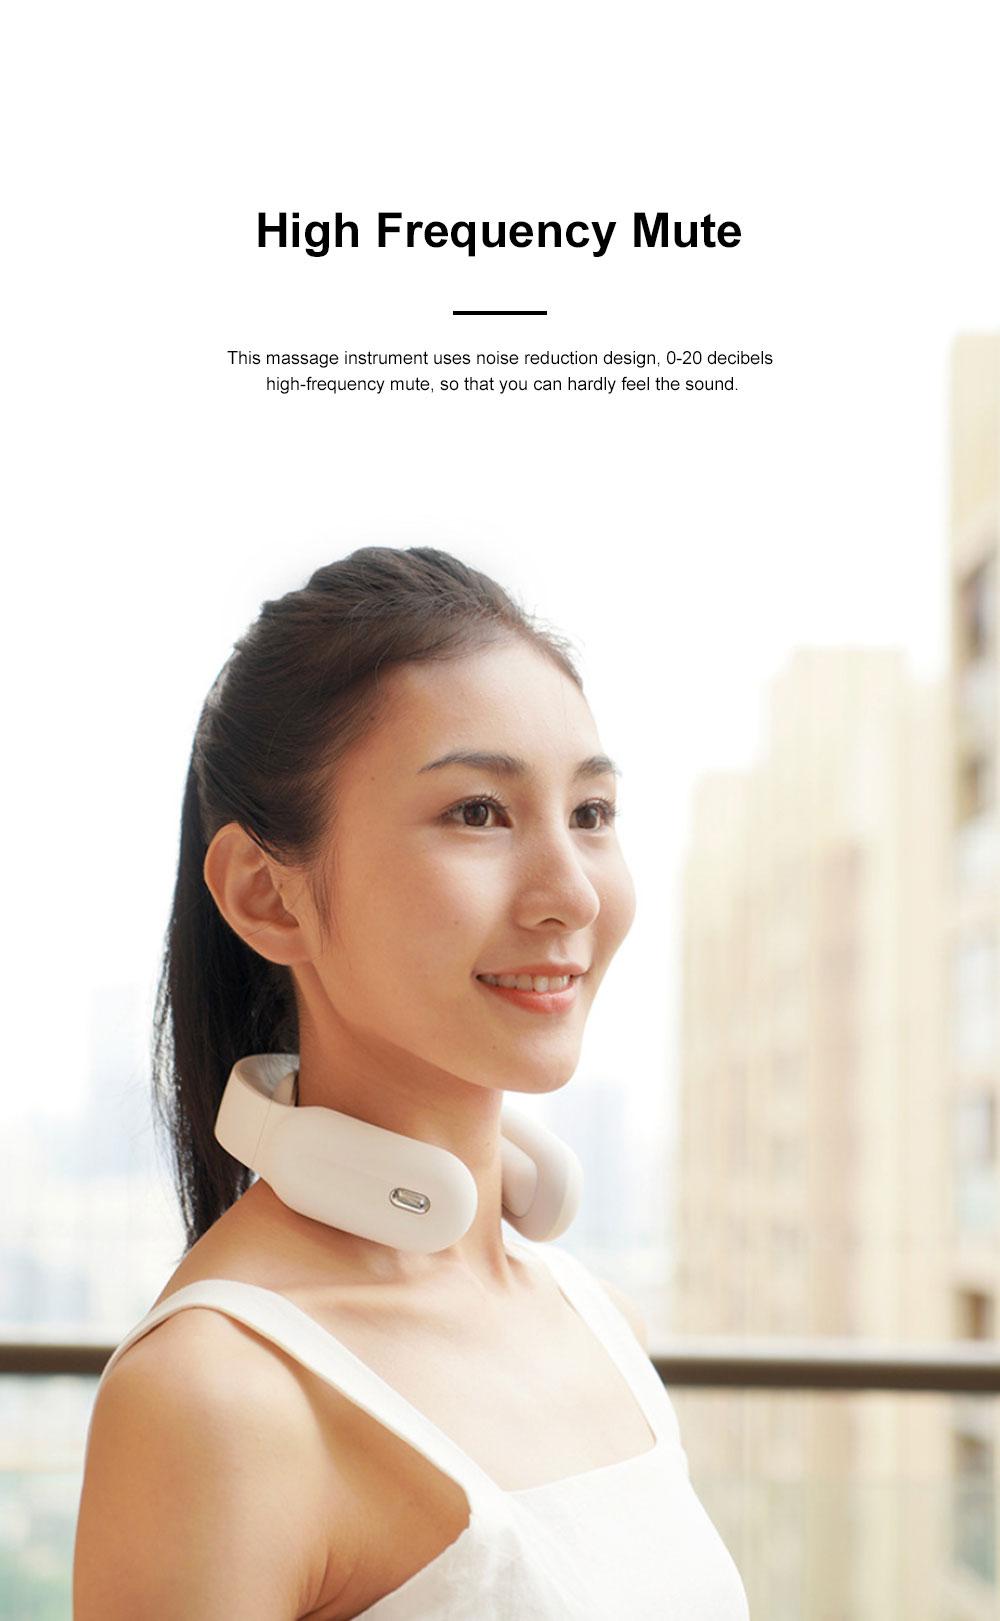 Household Electric Neck Massage Instrument Intelligent Multifunctional Nursing Instrument for Neck Shoulder Waist and Neck 5